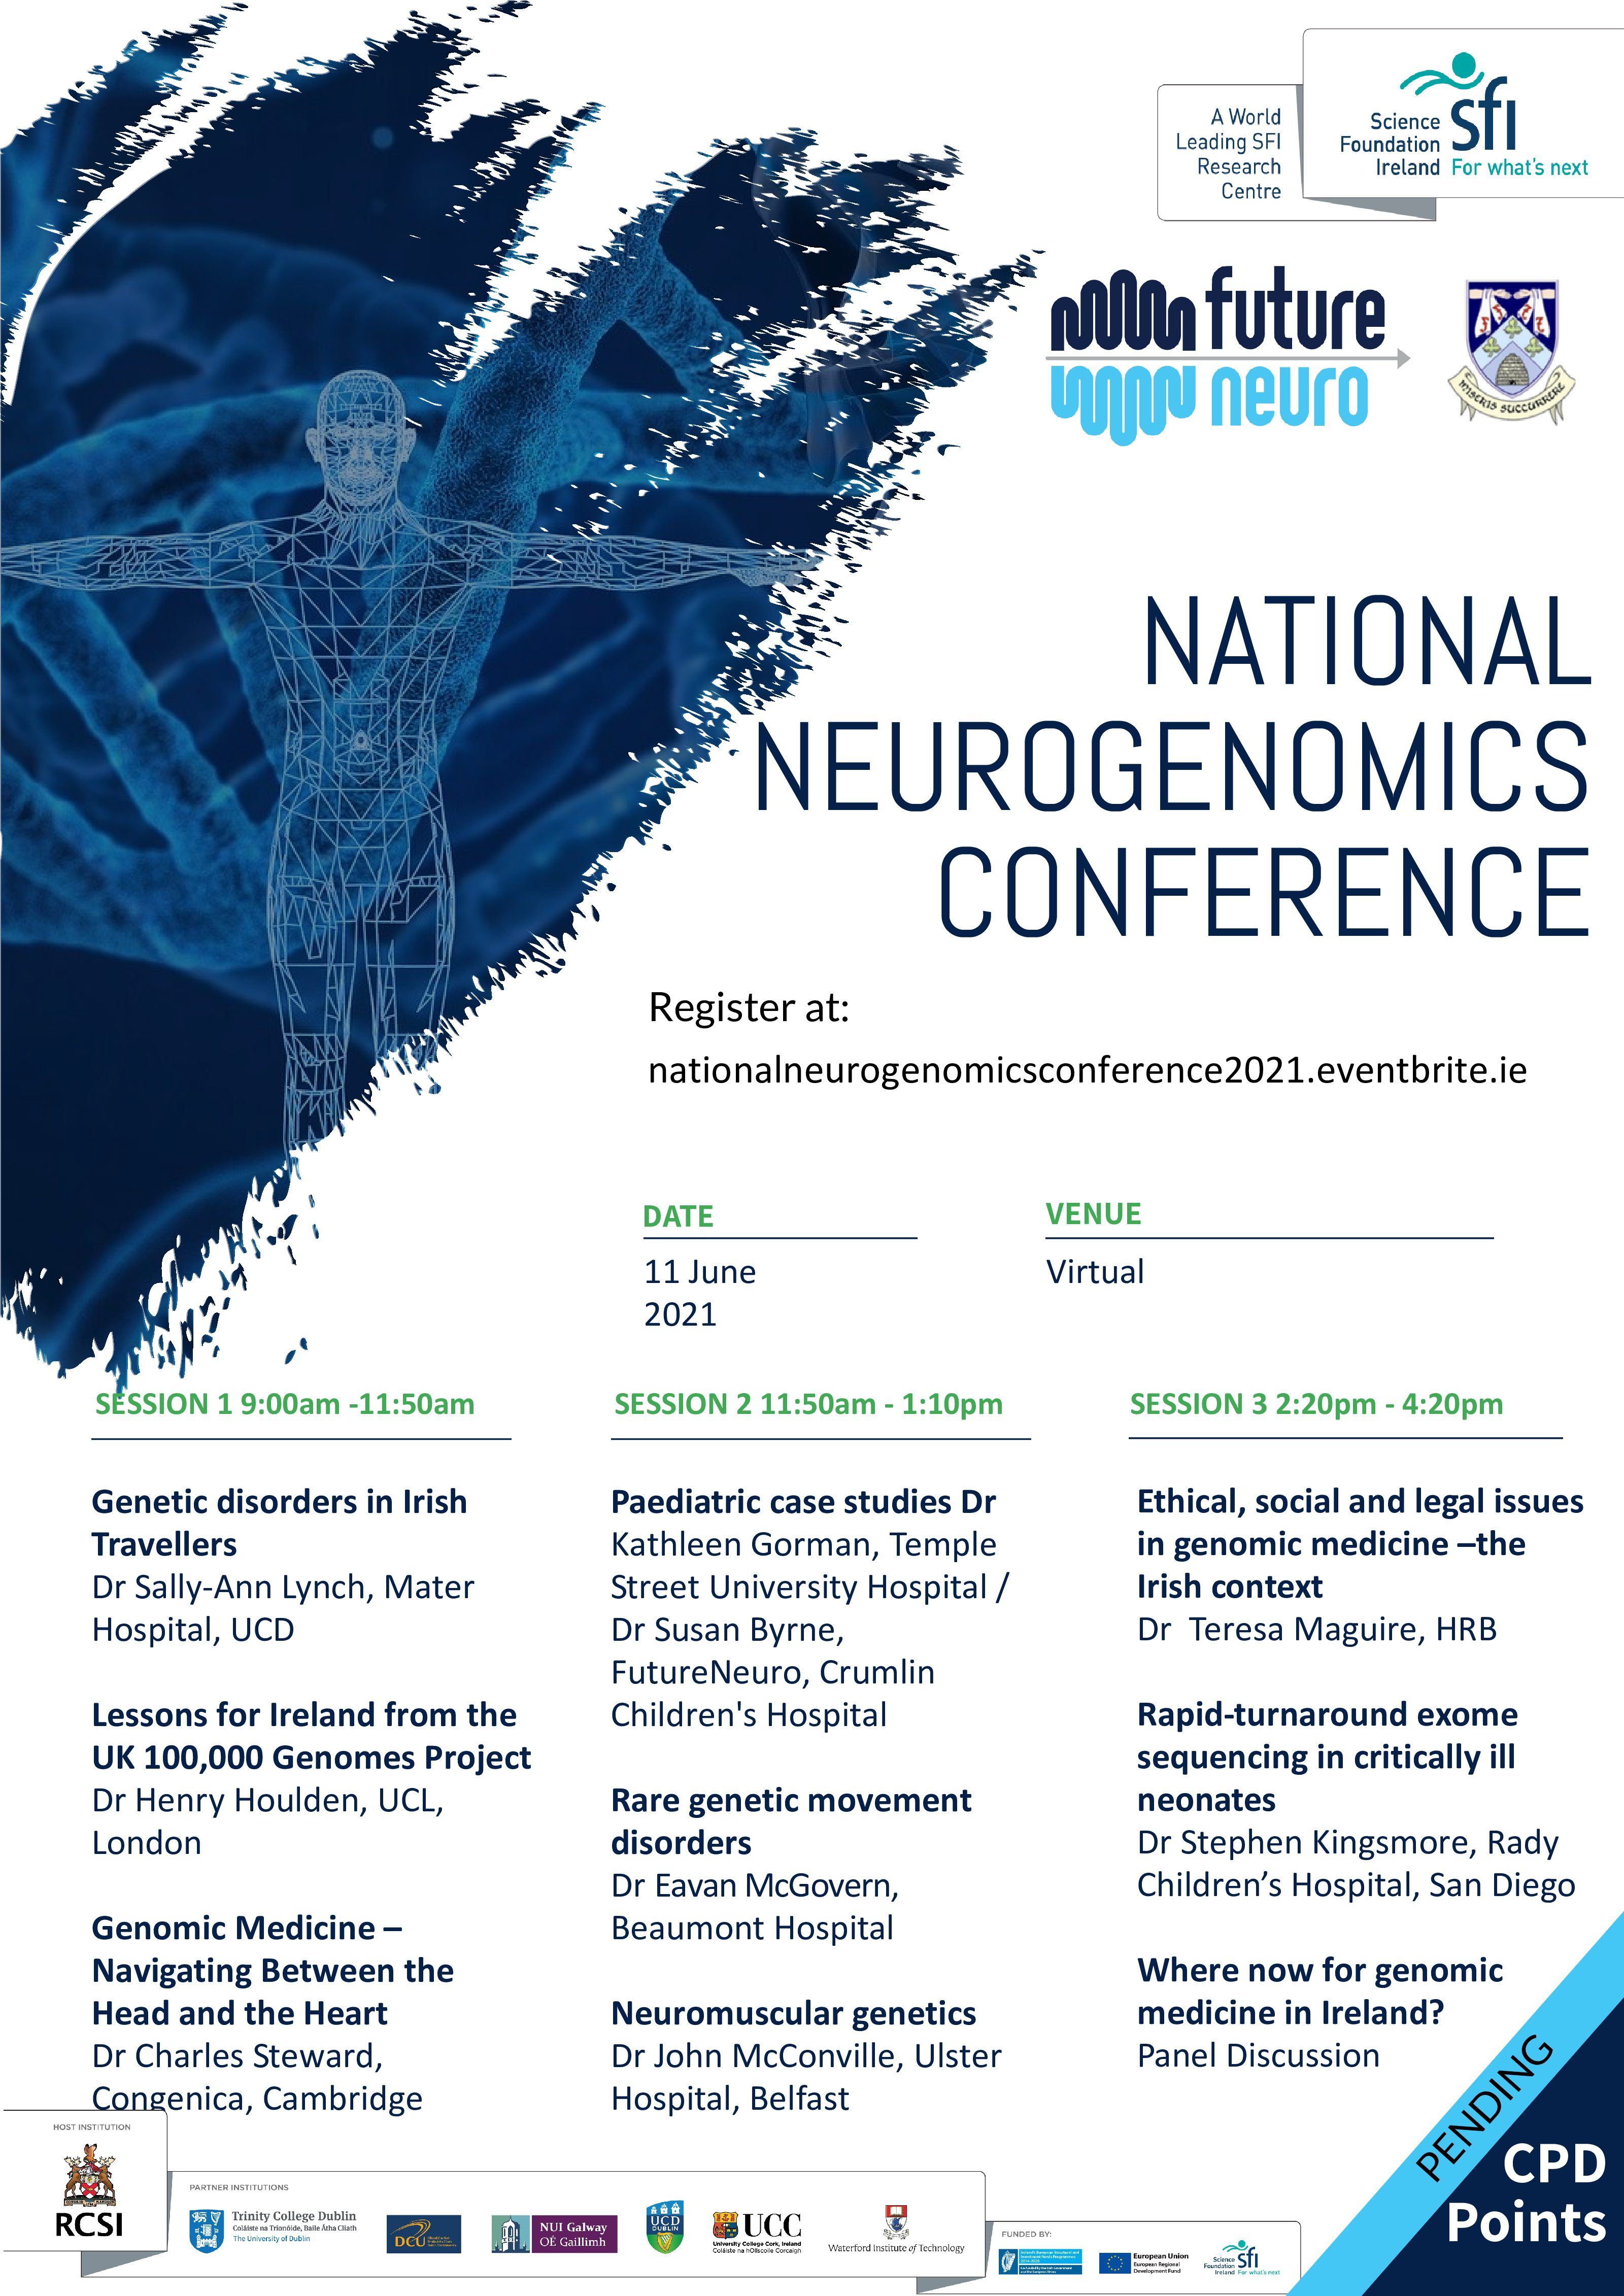 FutureNeuro Hosts National Neurogenomics Conference